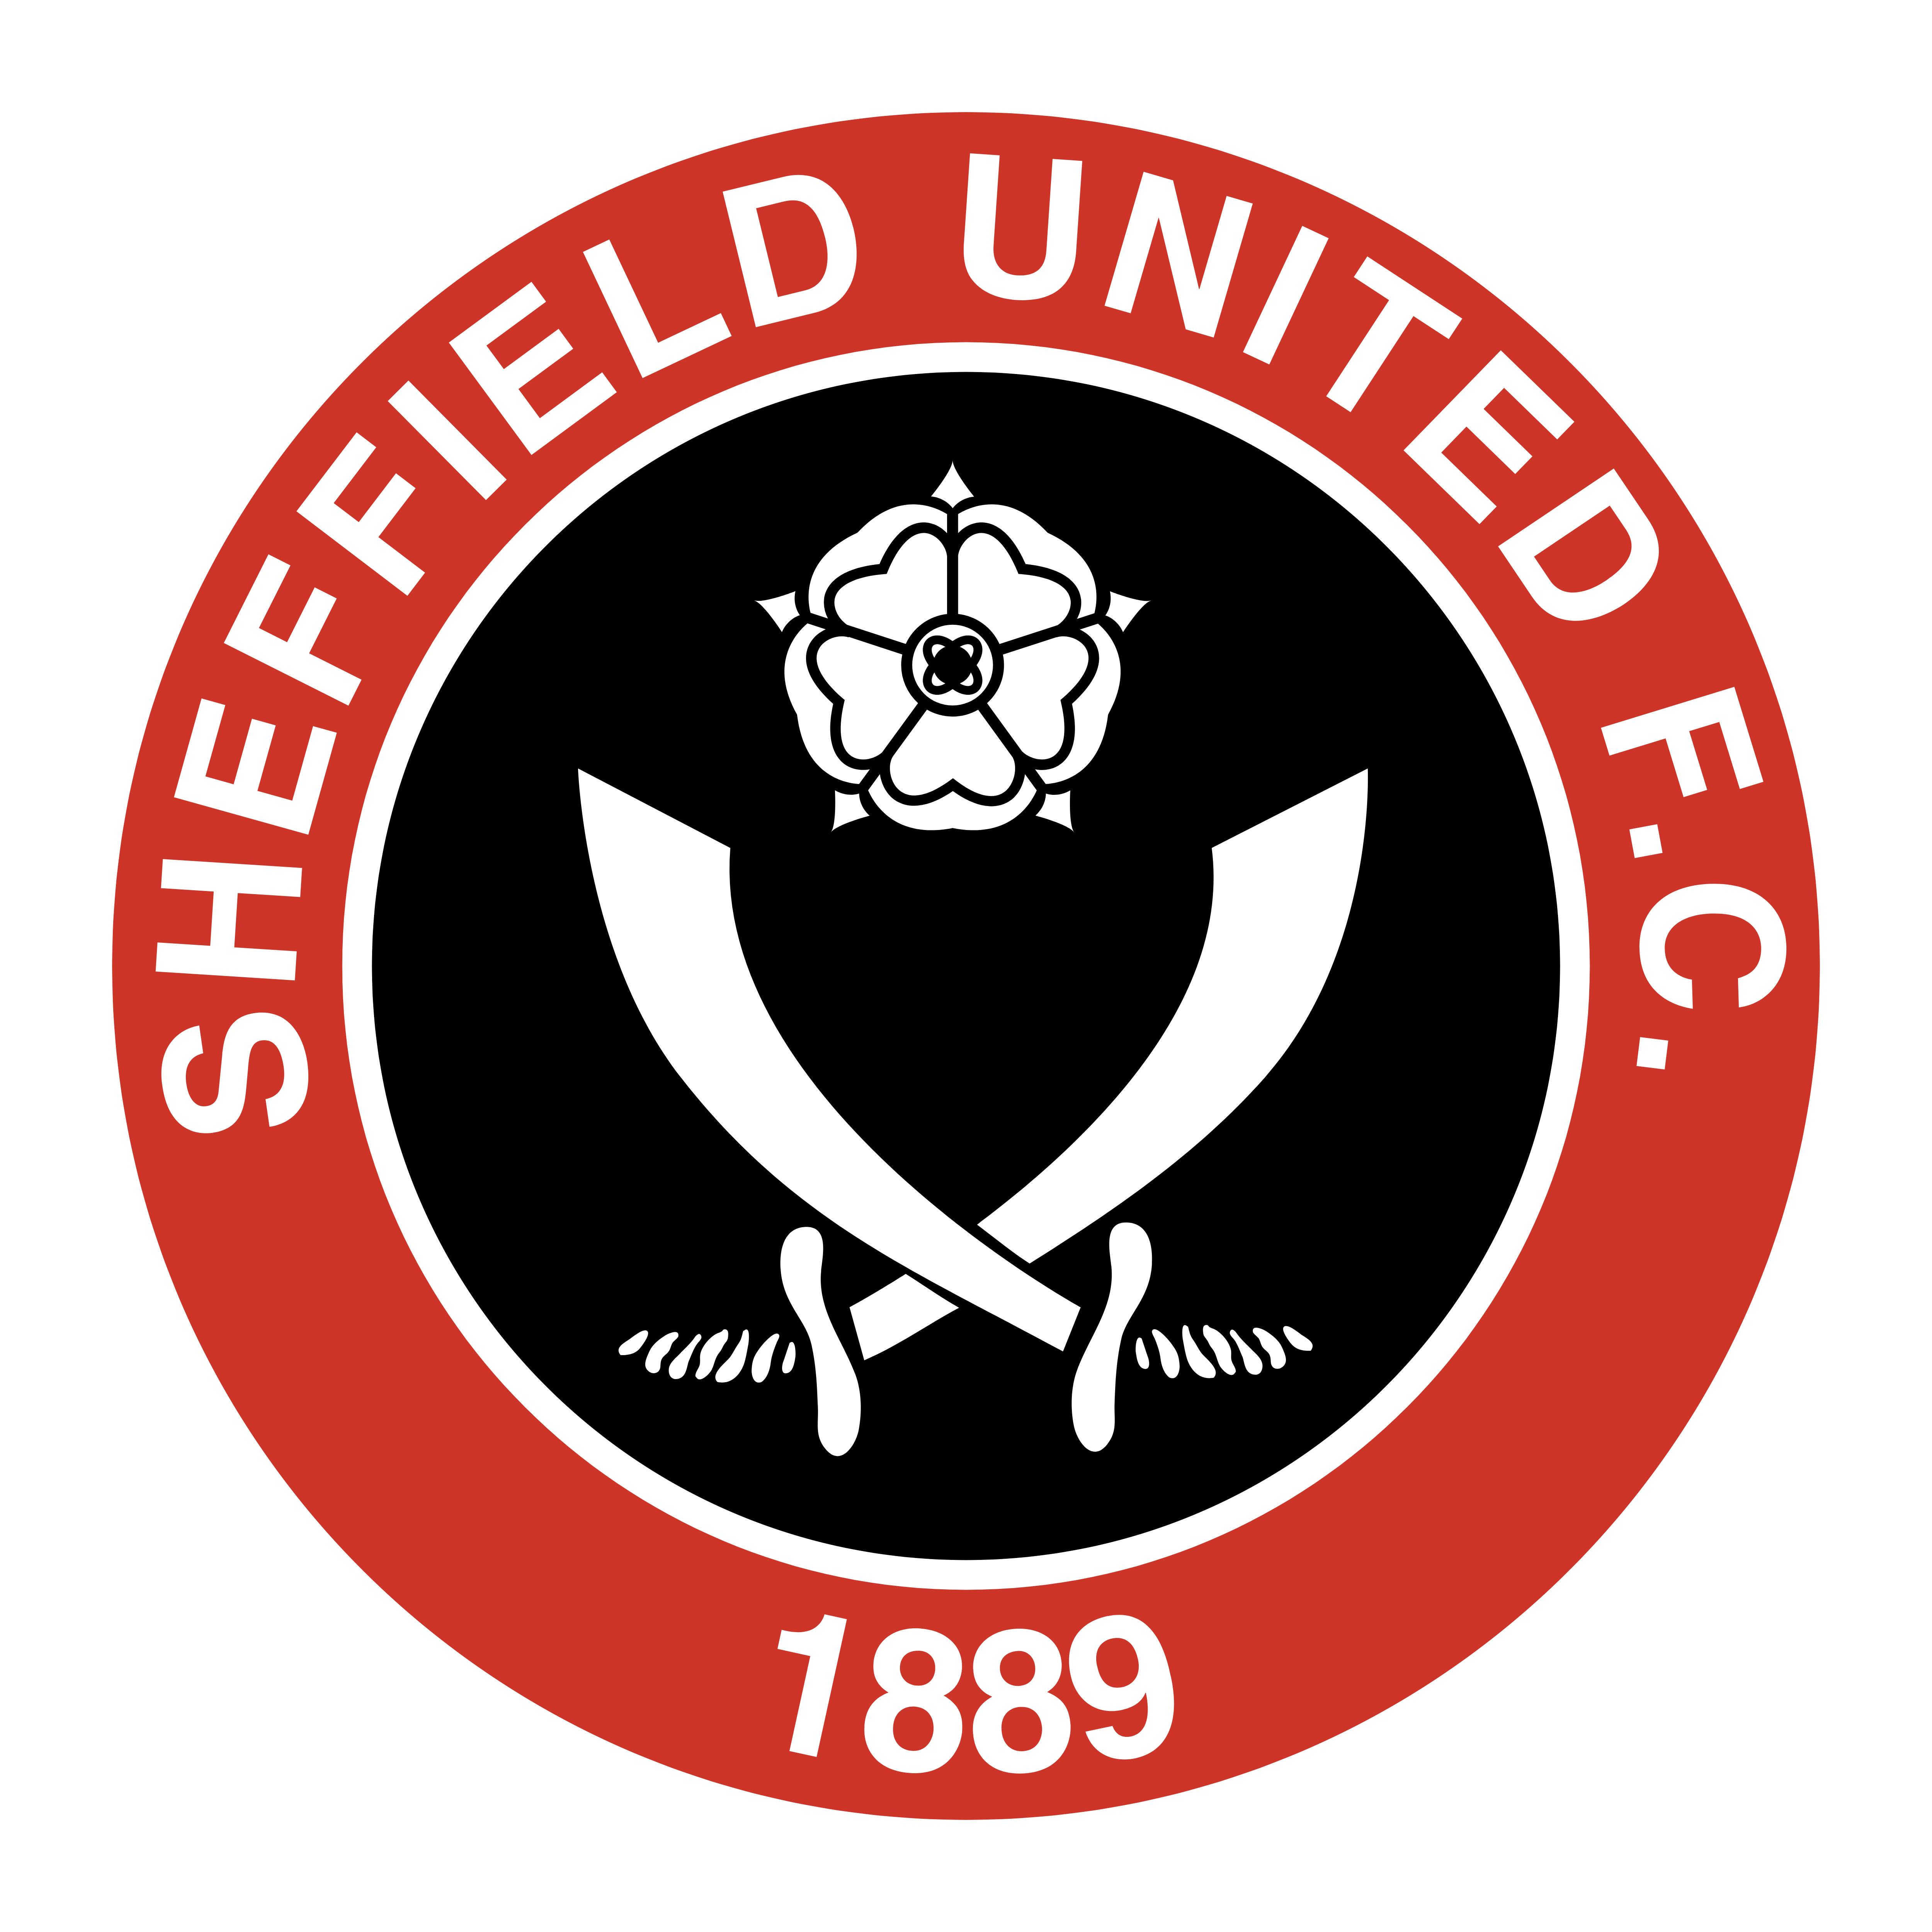 sheffield united fc � logos download